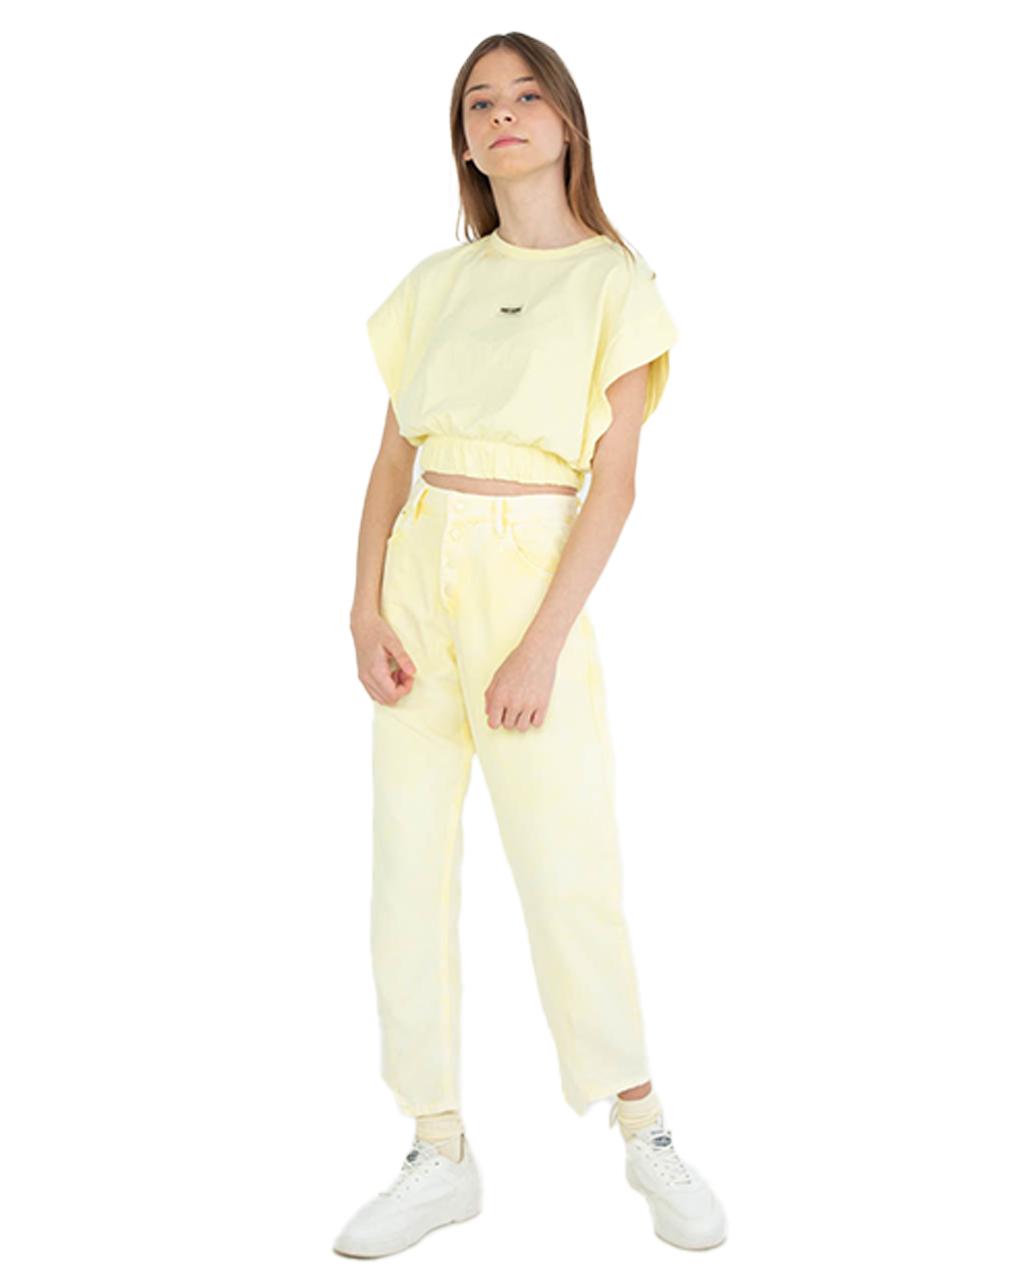 Blusa Cropped Teen Elastico na Barra Amarela Dimy Candy